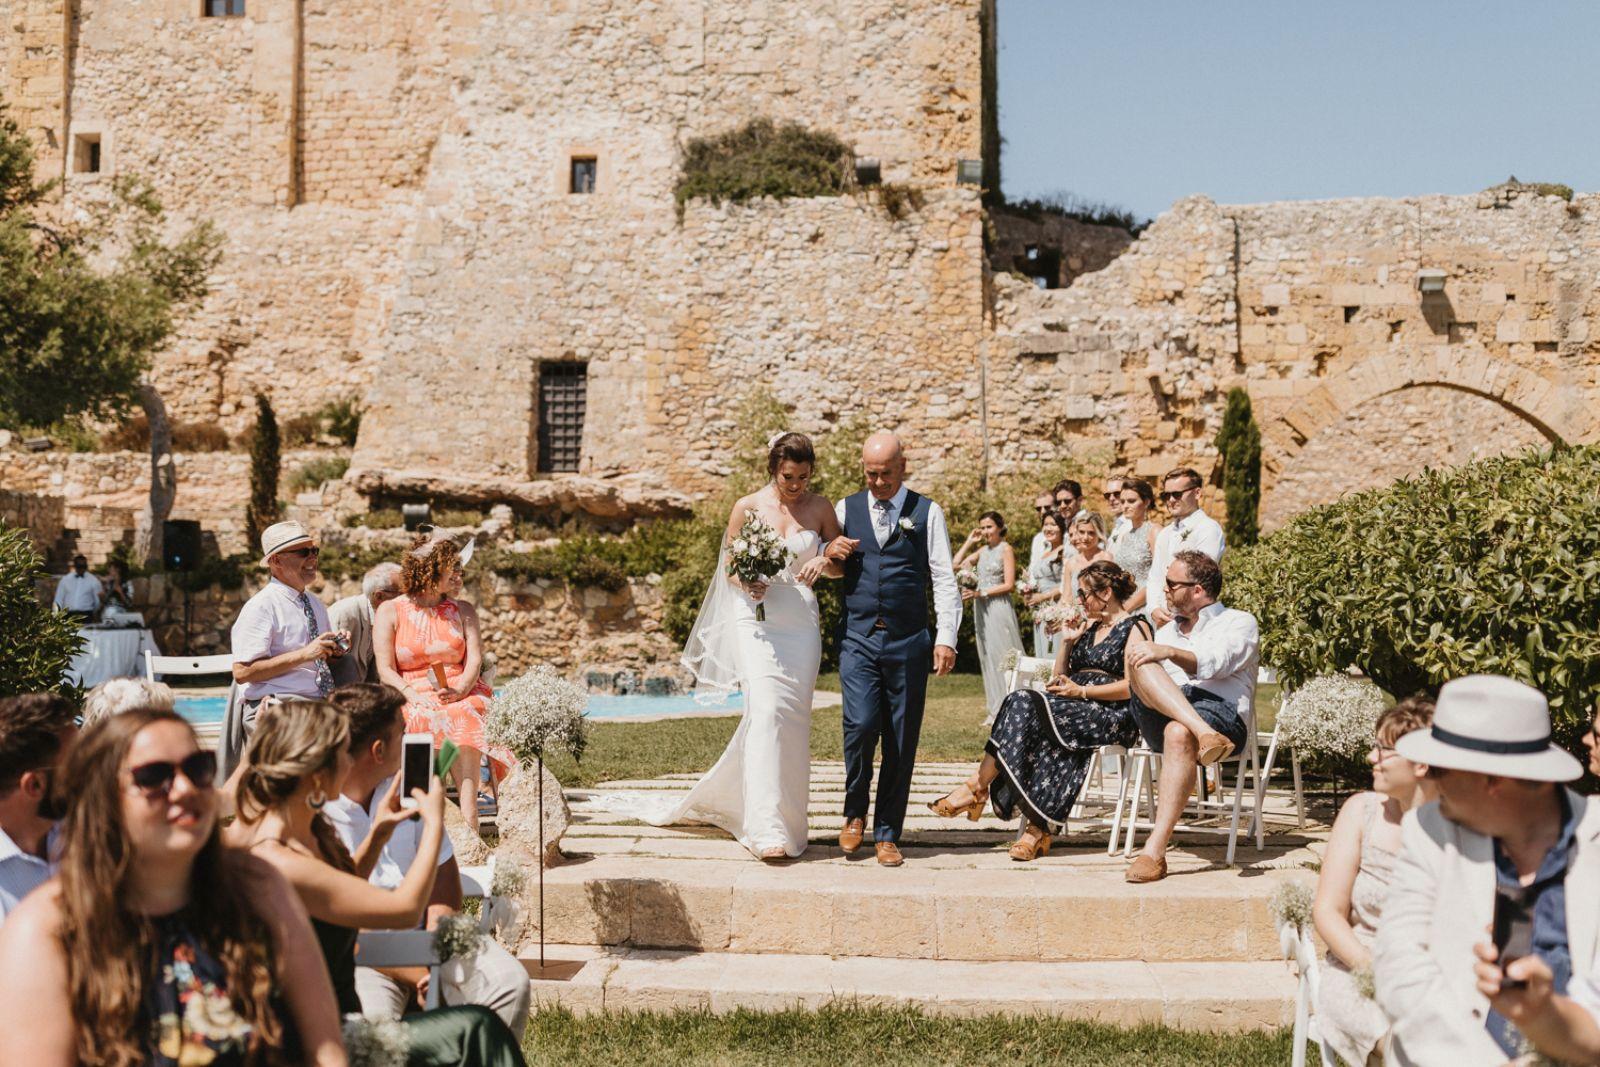 Castell de Tamarit Destination Wedding Just Married Barcerlona Bride Ceremony